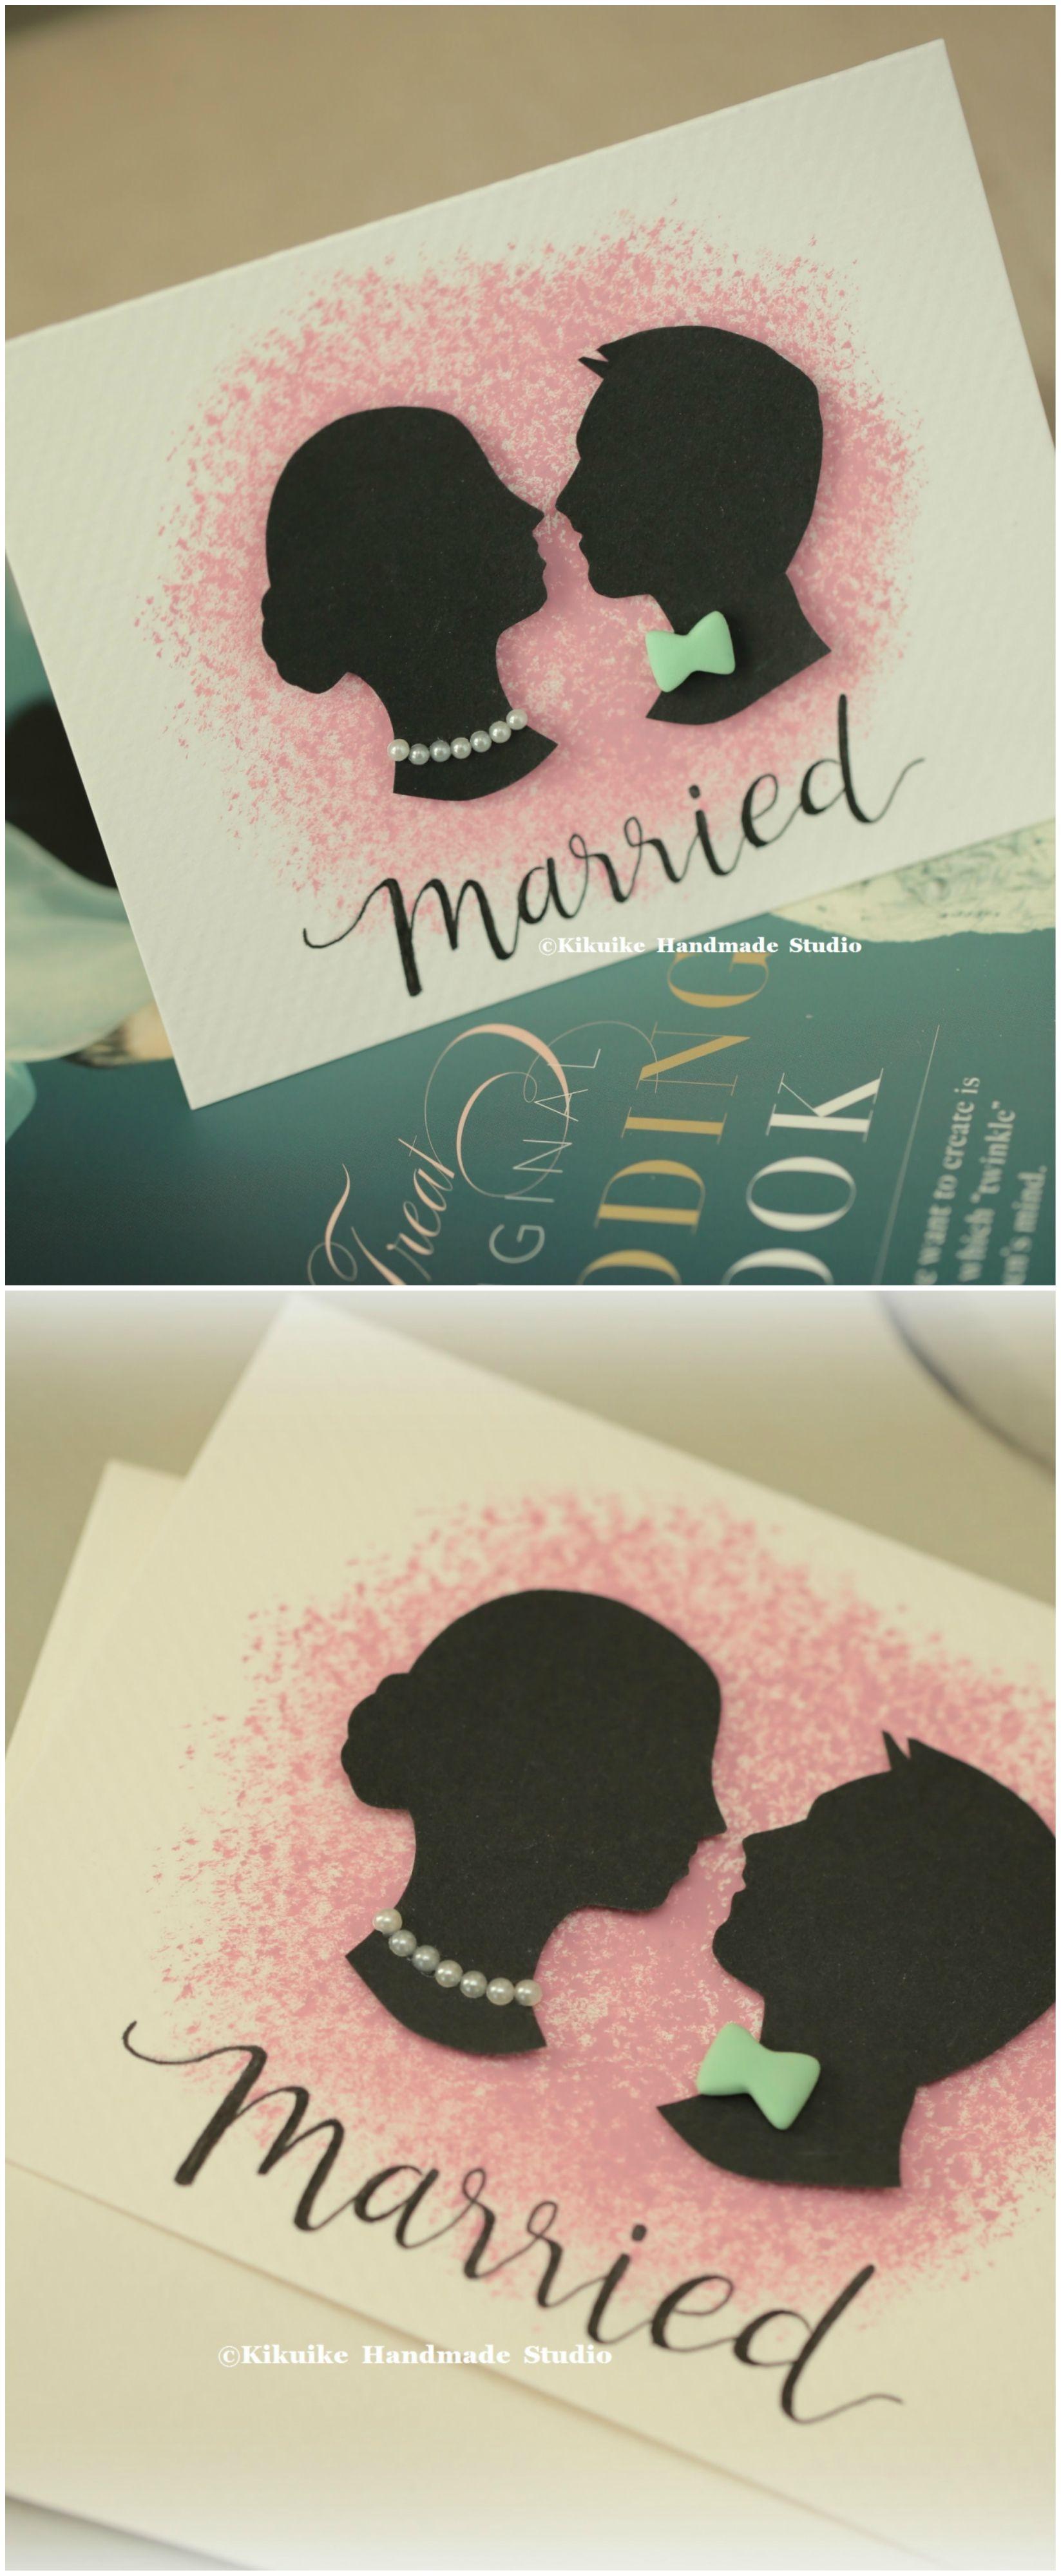 Personalized Wedding Cardcouple Greeting Cardcongratulations